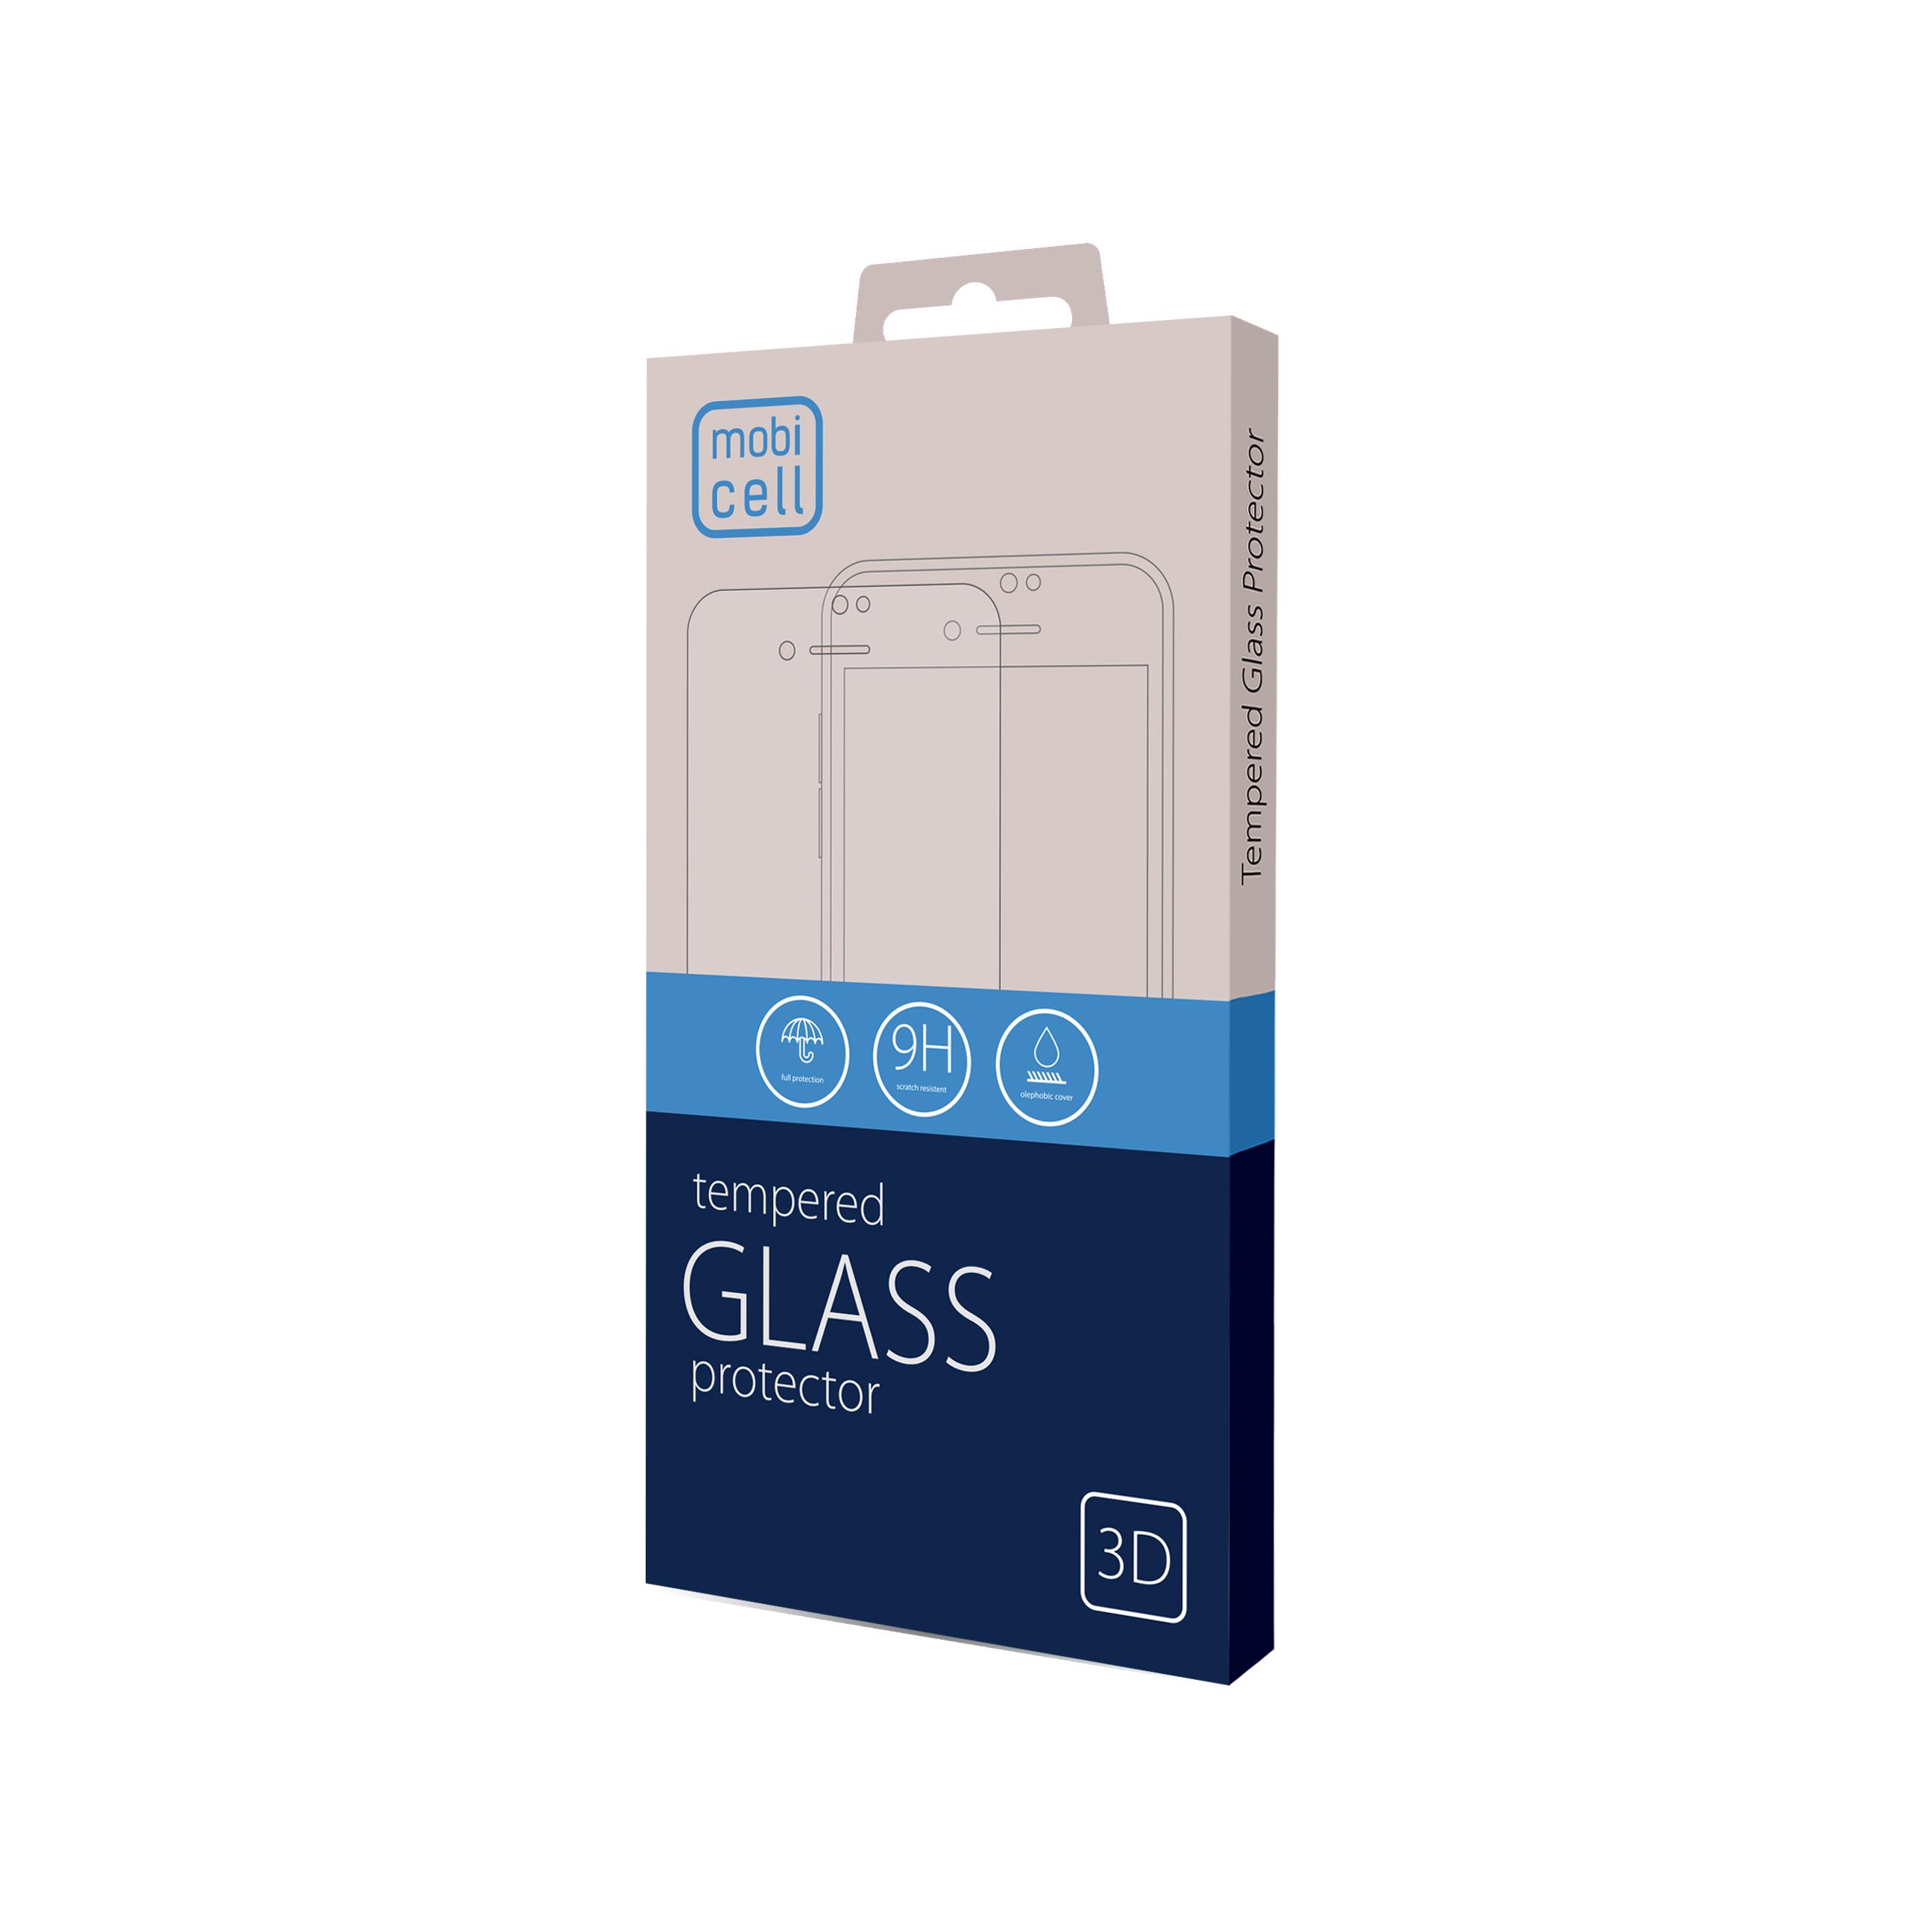 Folie protectie 3d full cover pentru iphone xs max/11 pro max negru